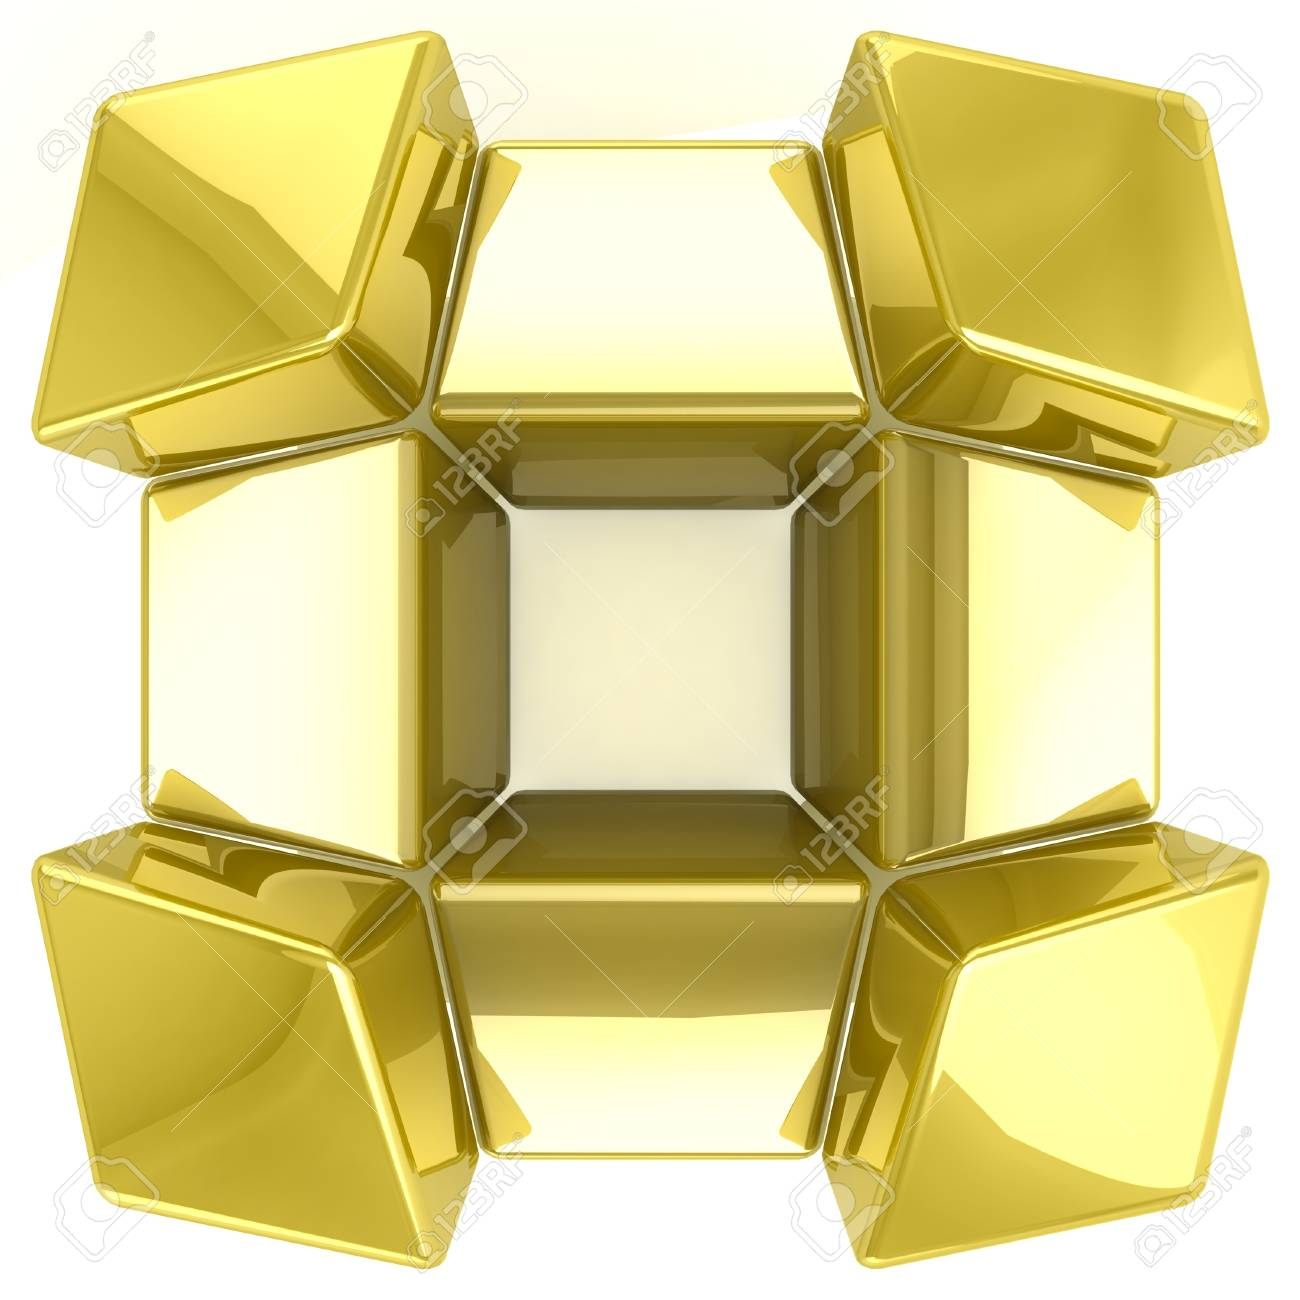 3D tiles background Stock Photo - 18326917